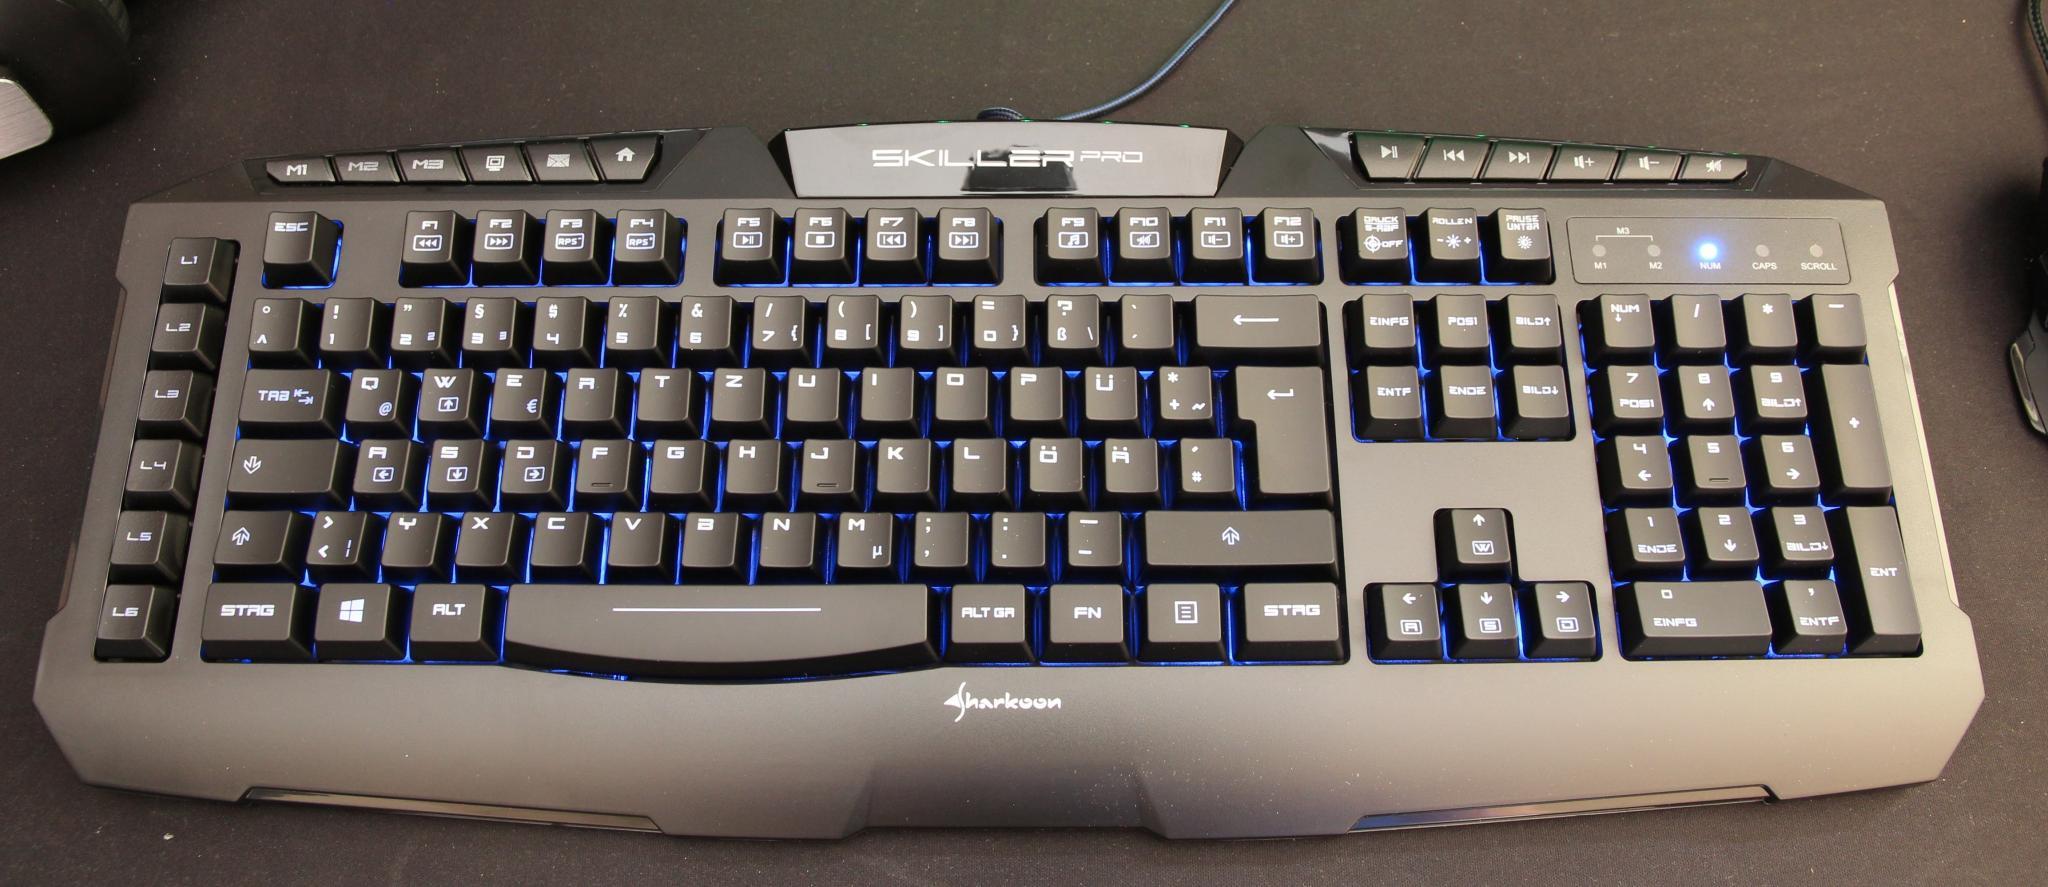 sharkoon tastatur-beleuchtung